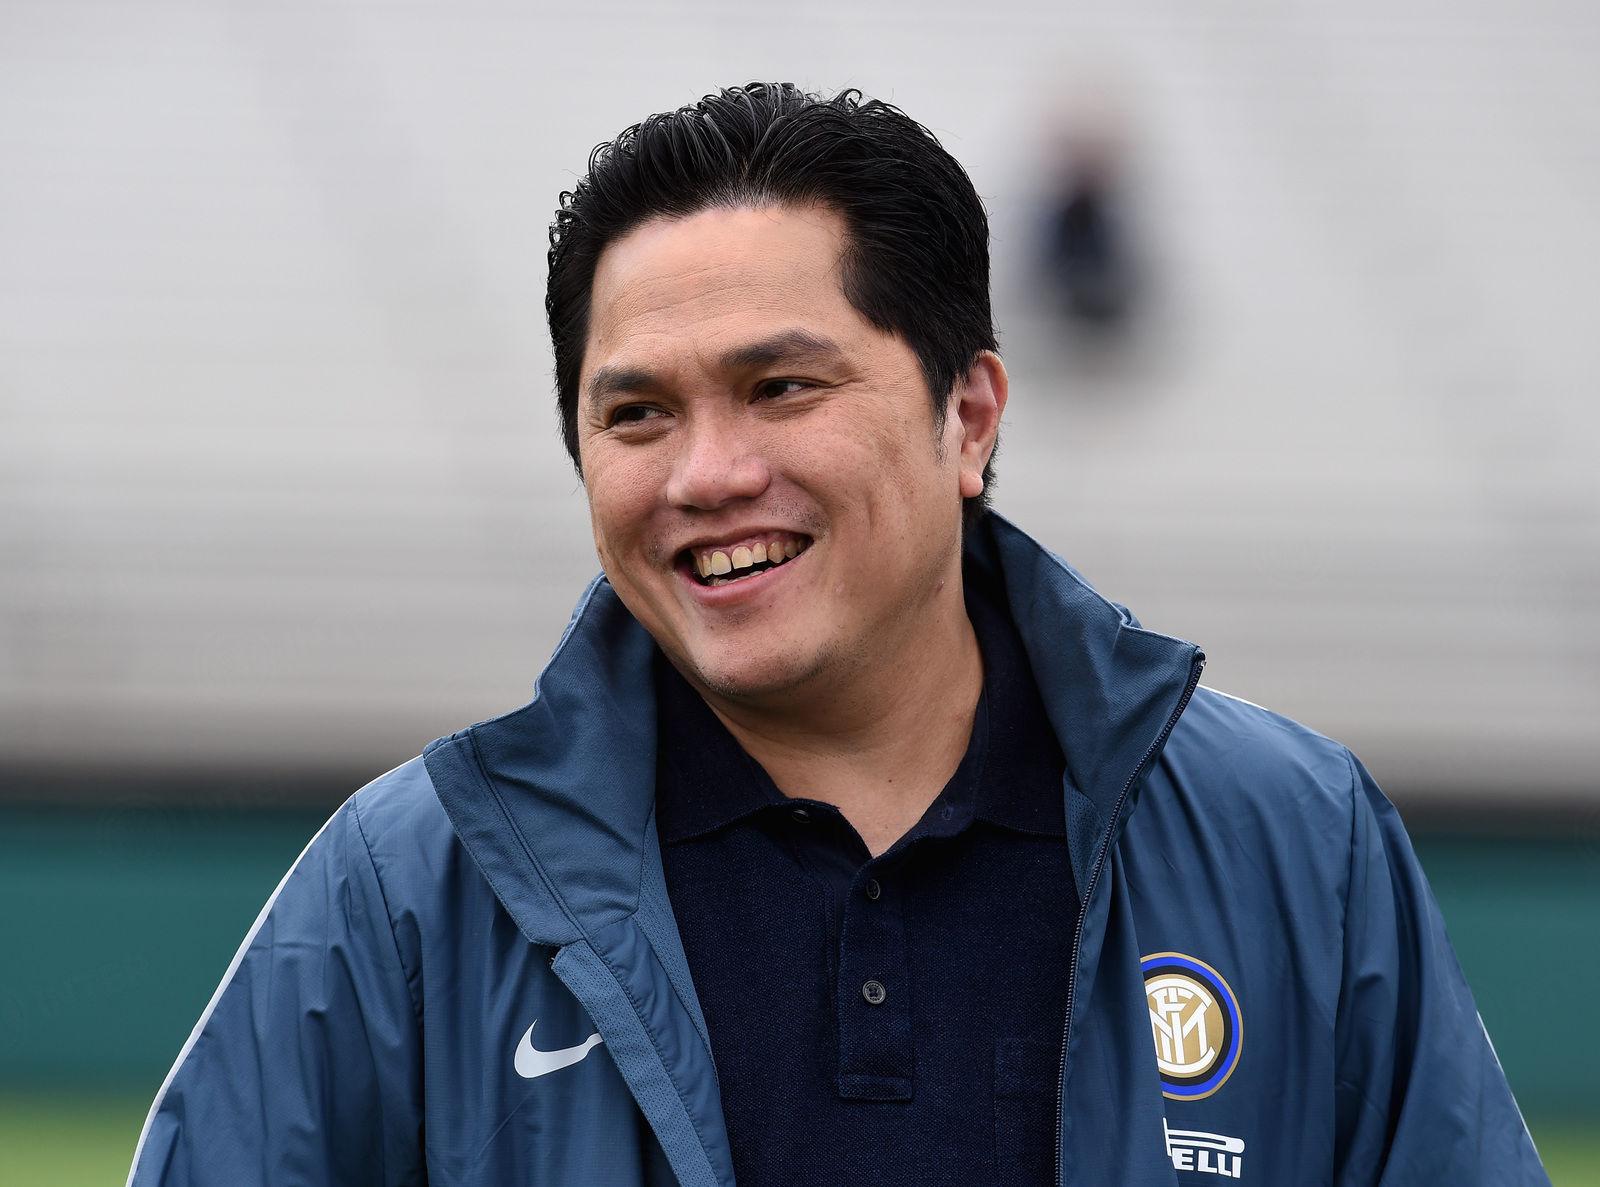 Selamat ulang tahun, Erick Thohir! | News